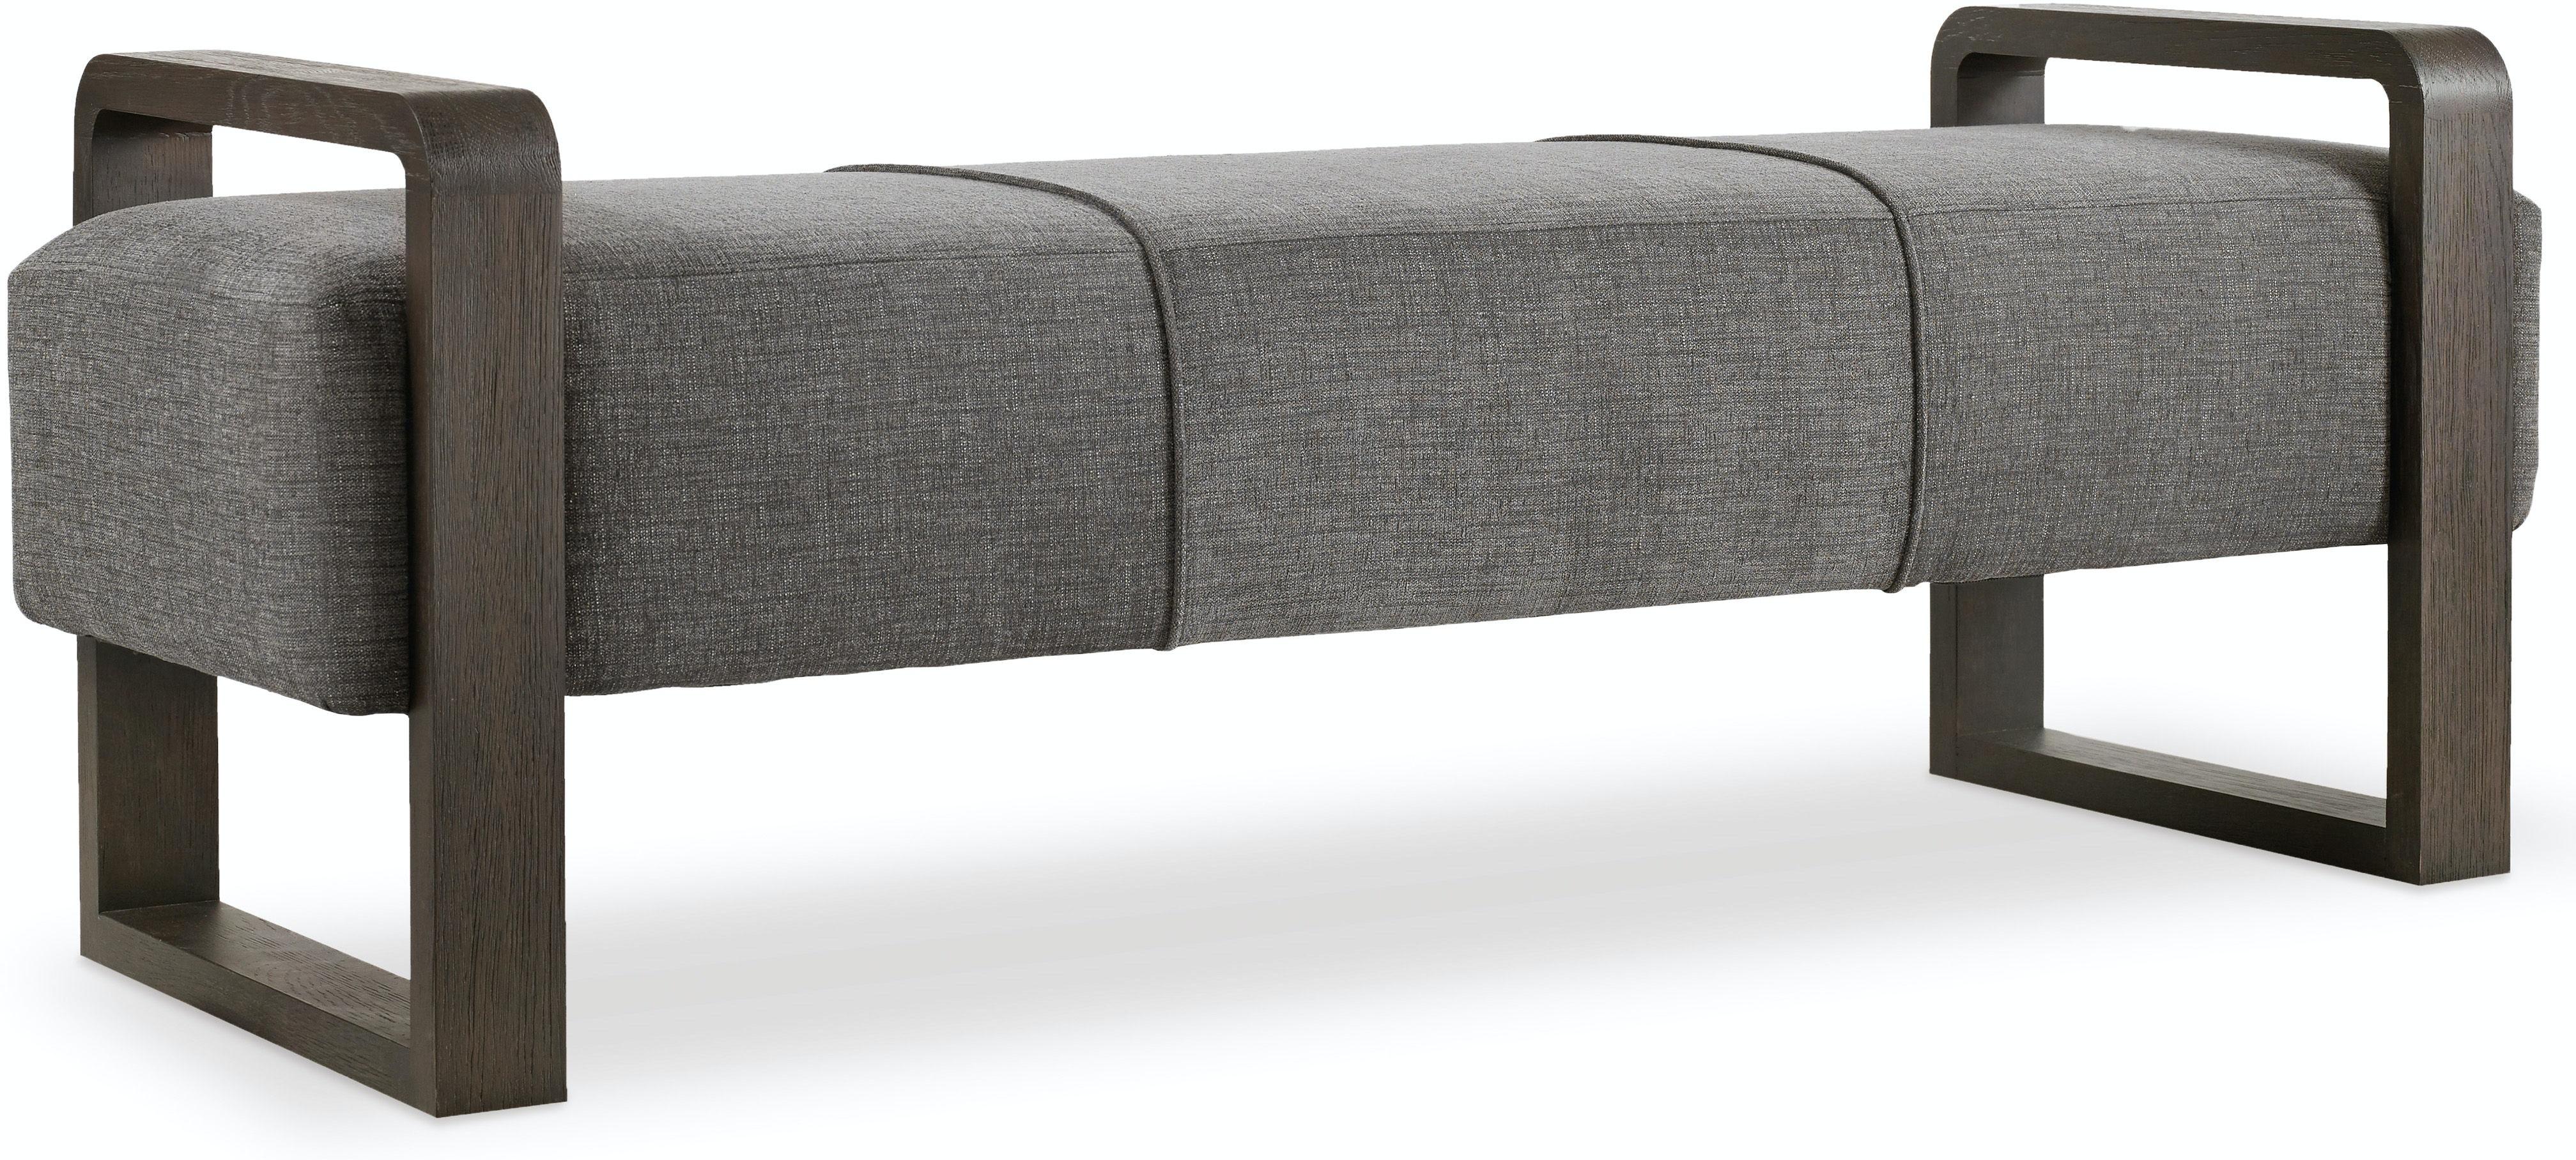 Furniture Living Room Curata Upholstered Bench 1600